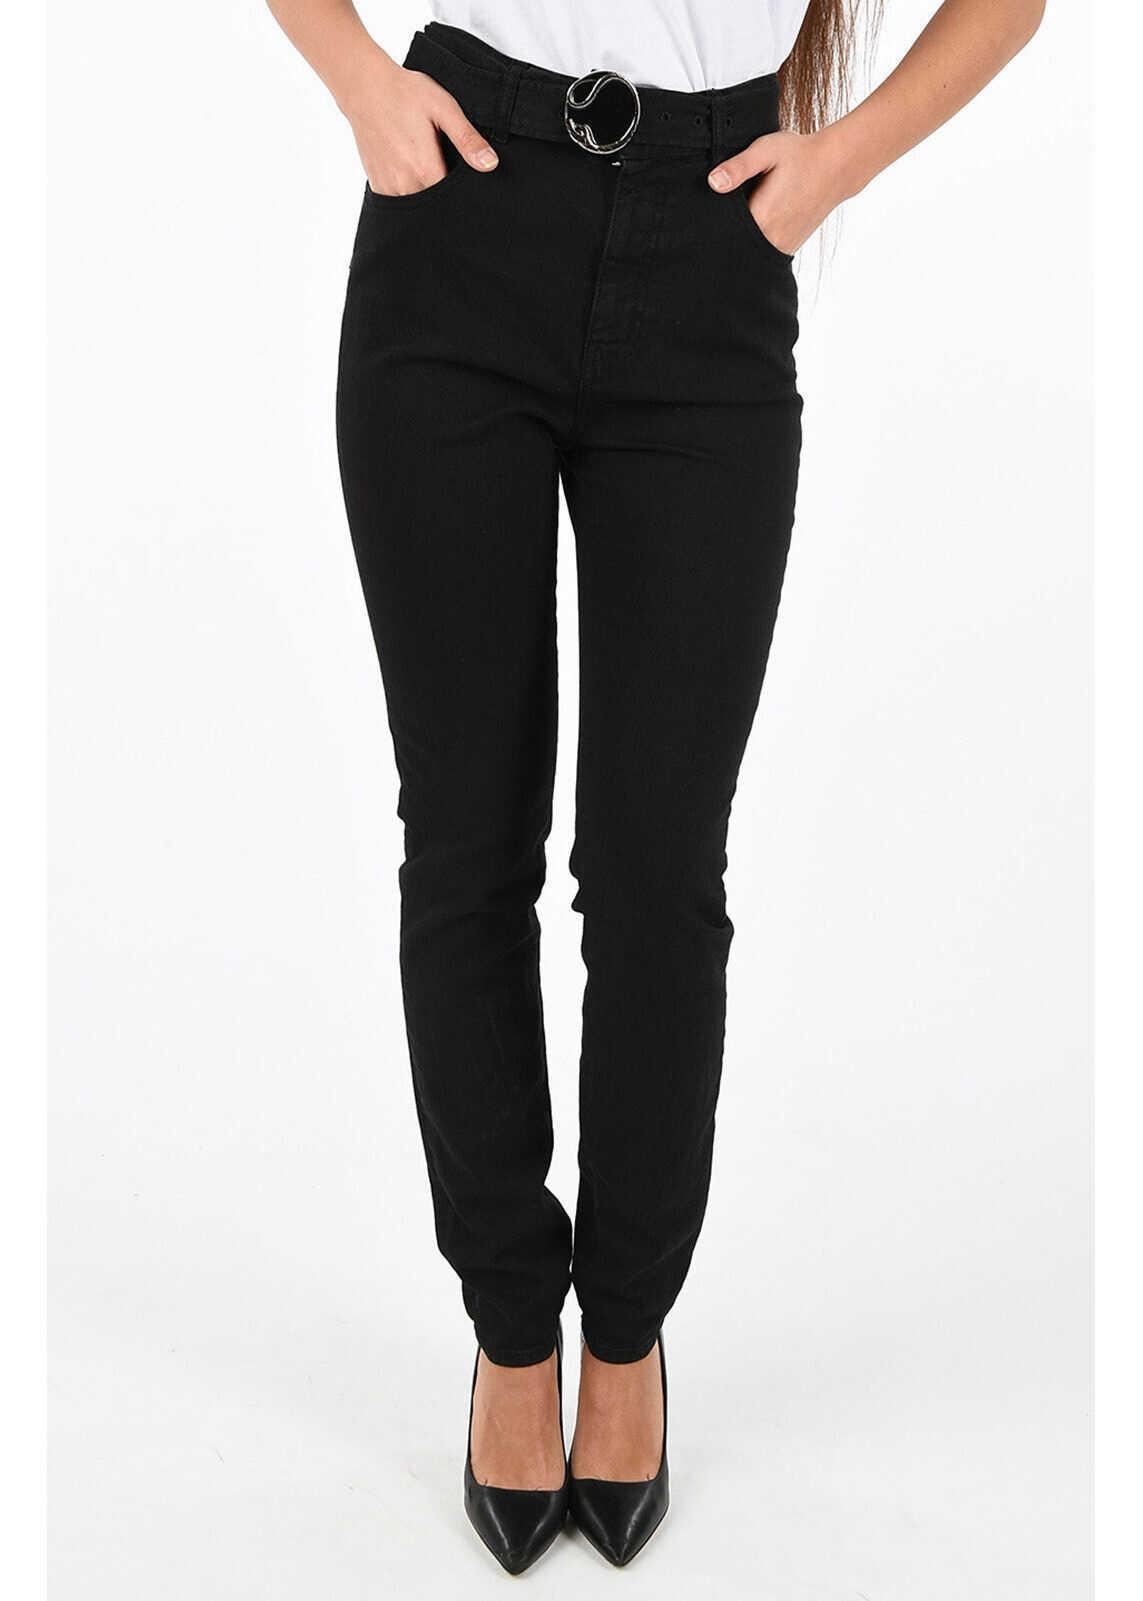 Just Cavalli Slim Fit Jeans with Belt BLACK